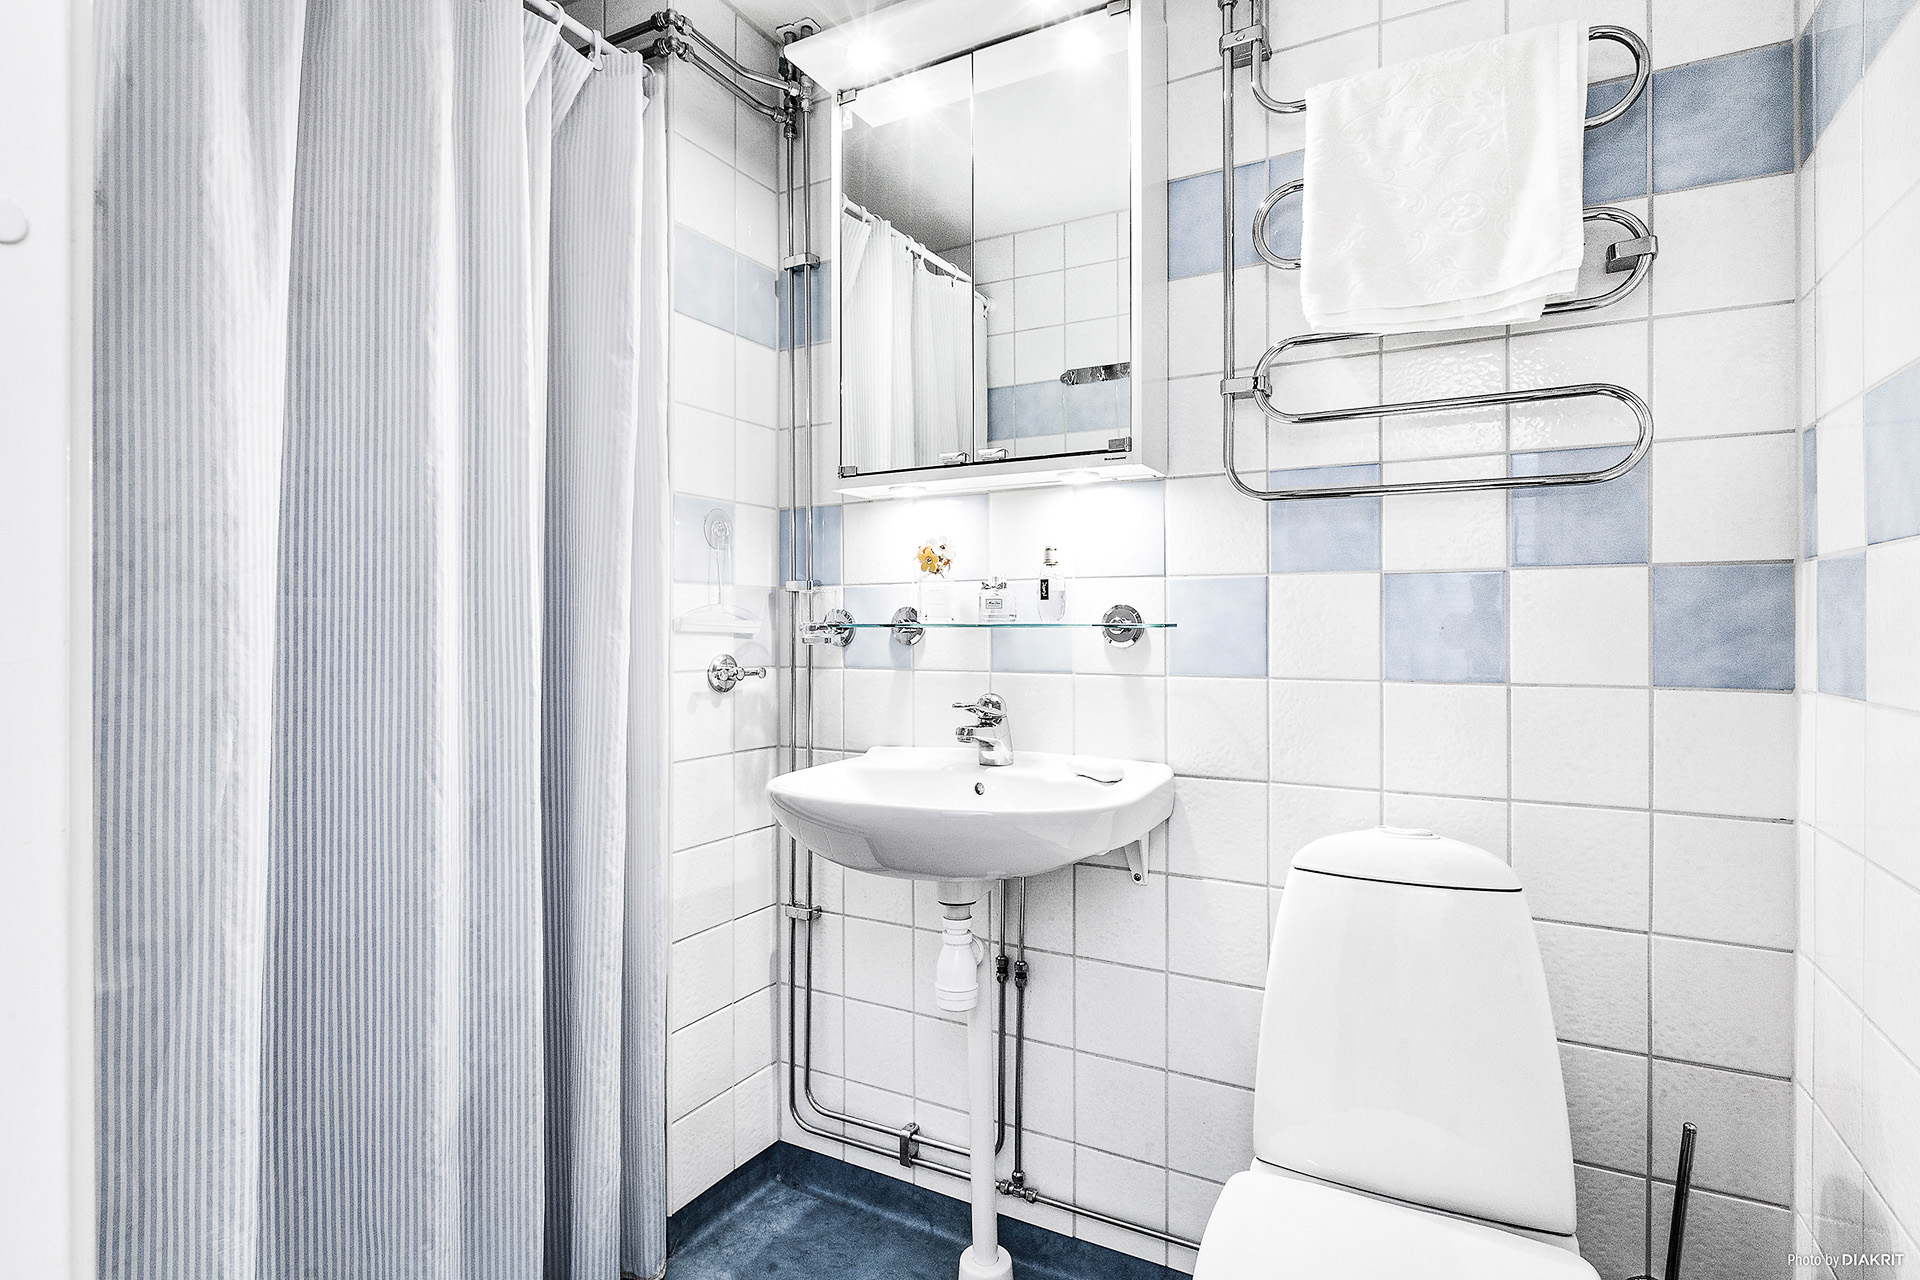 Gästtoalett med dusch